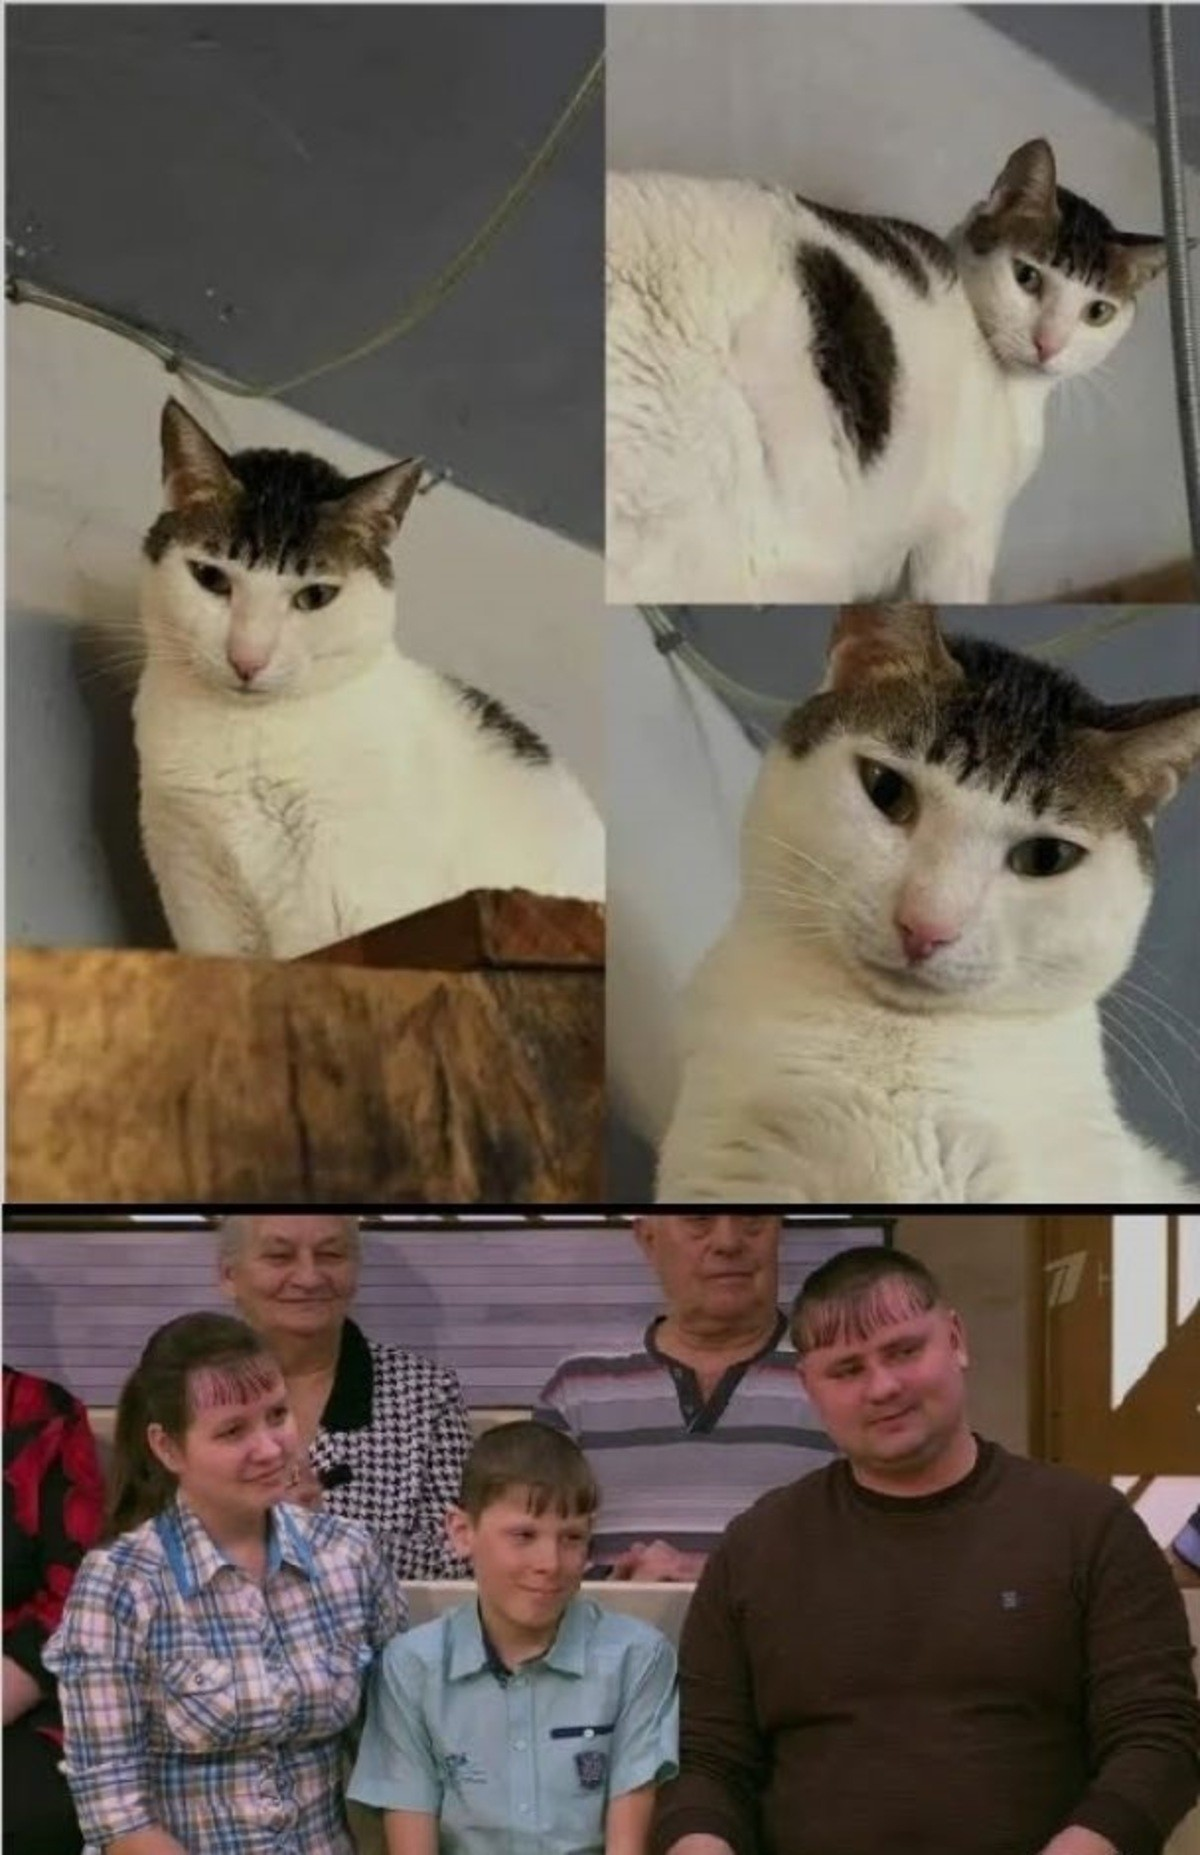 Family Pet. .. I would call this cat Boris